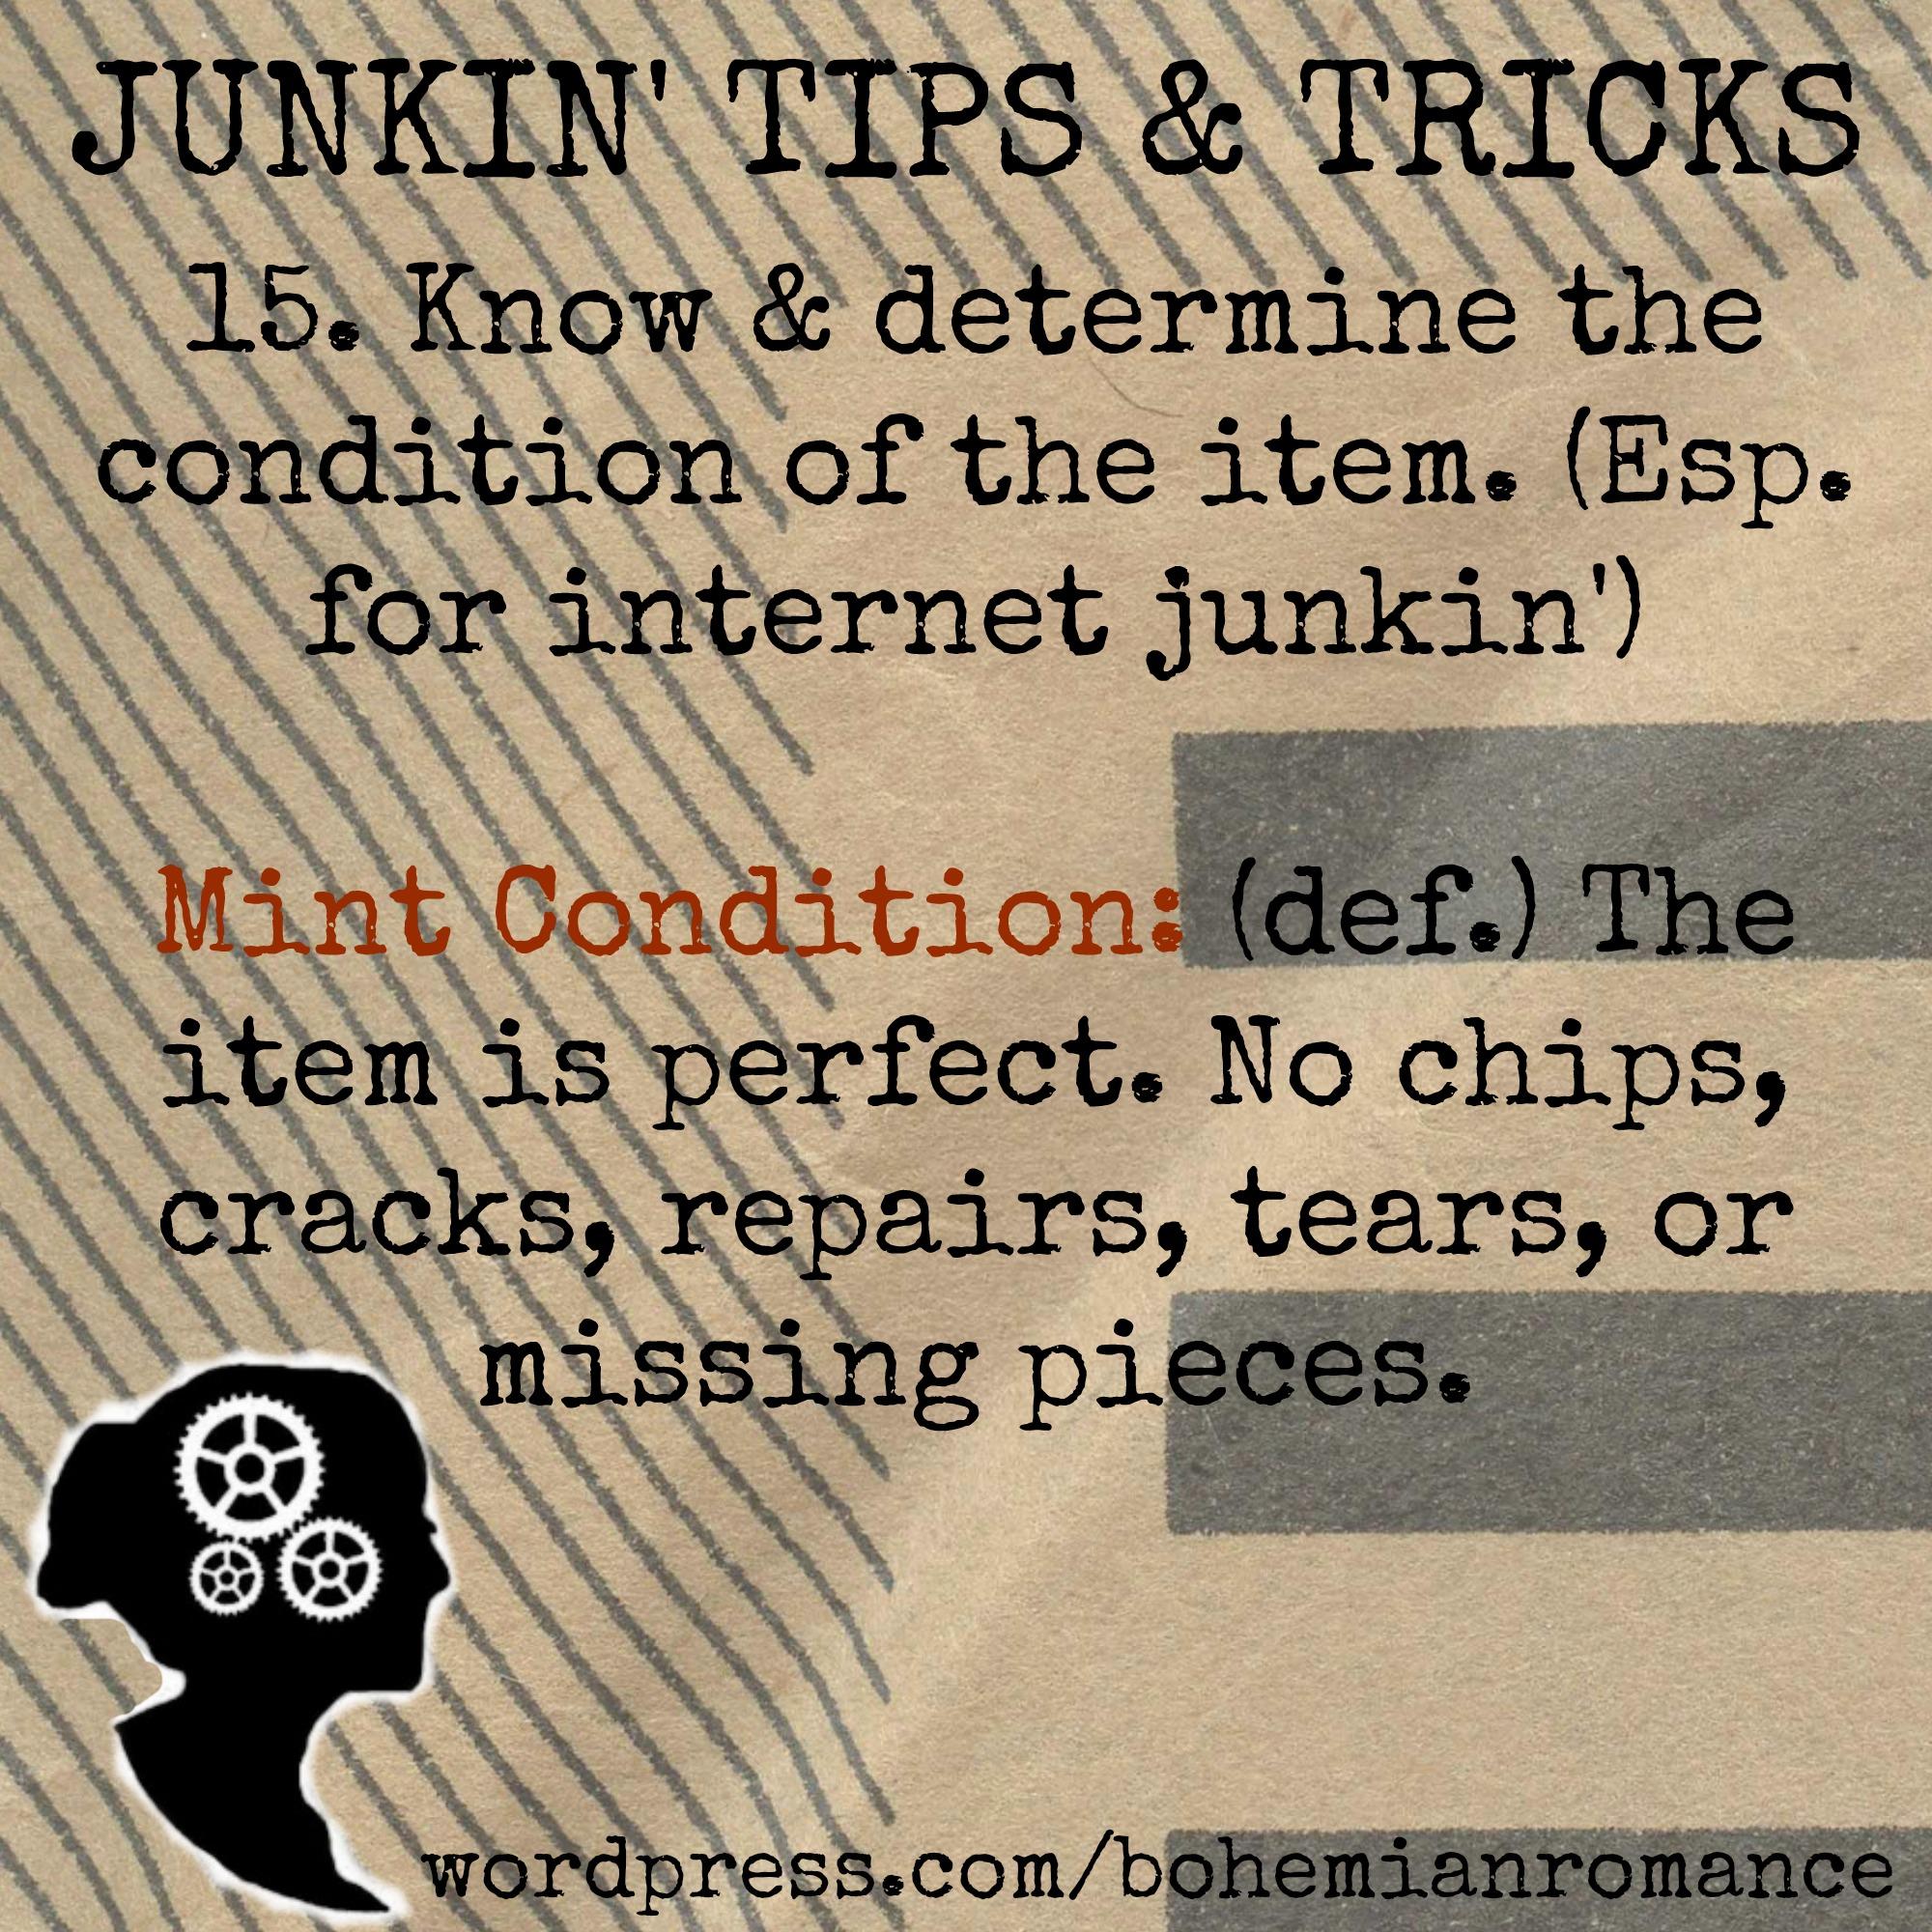 Junkin Tips 15